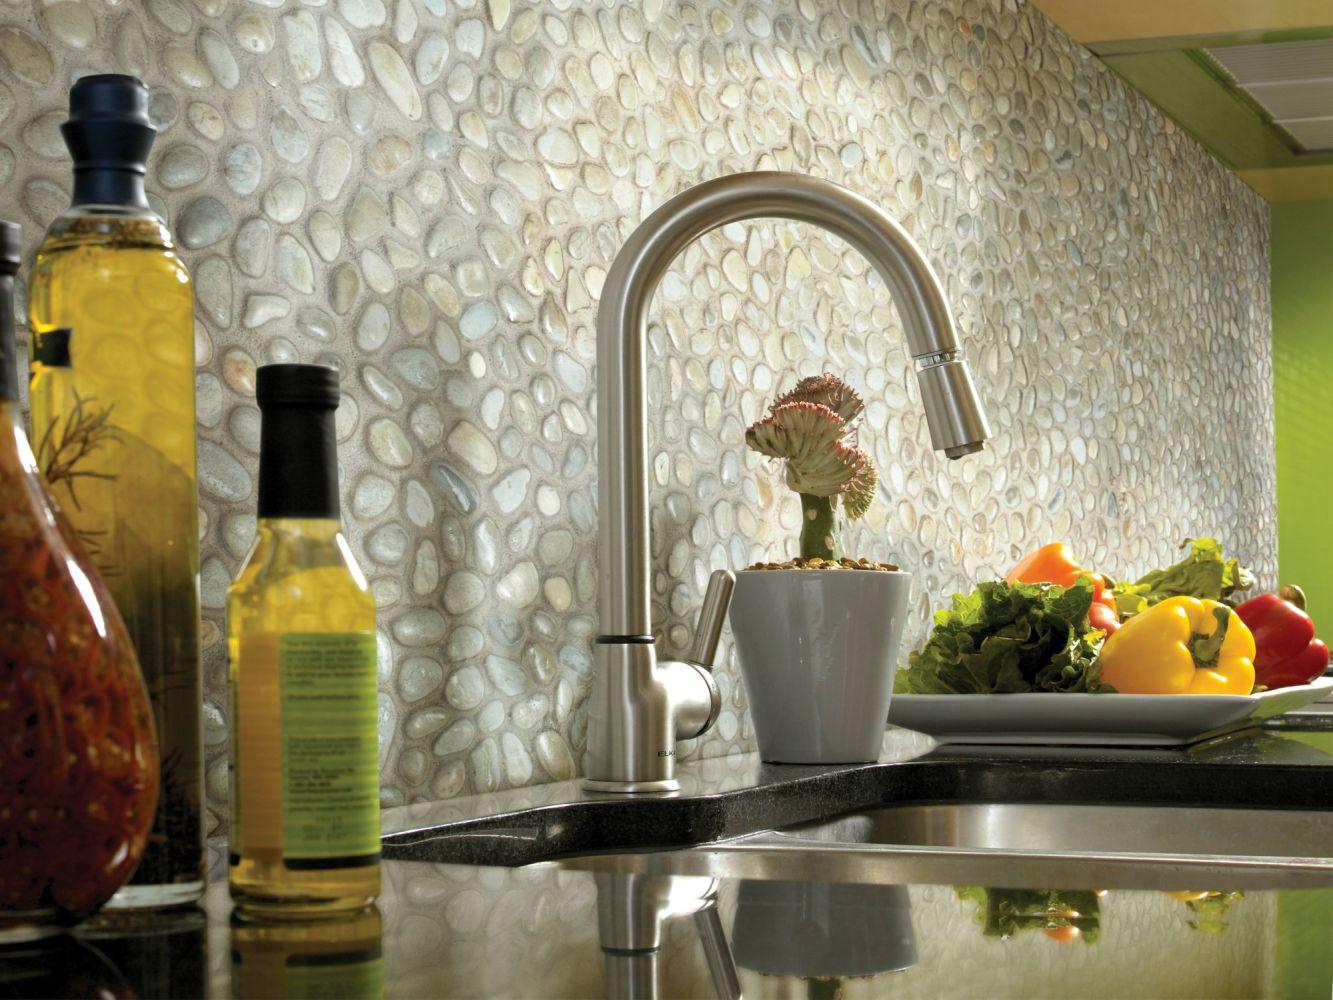 Shaw Floors Home Fn Gold Ceramic River Rock Honed Pearl White 00100_TGL65